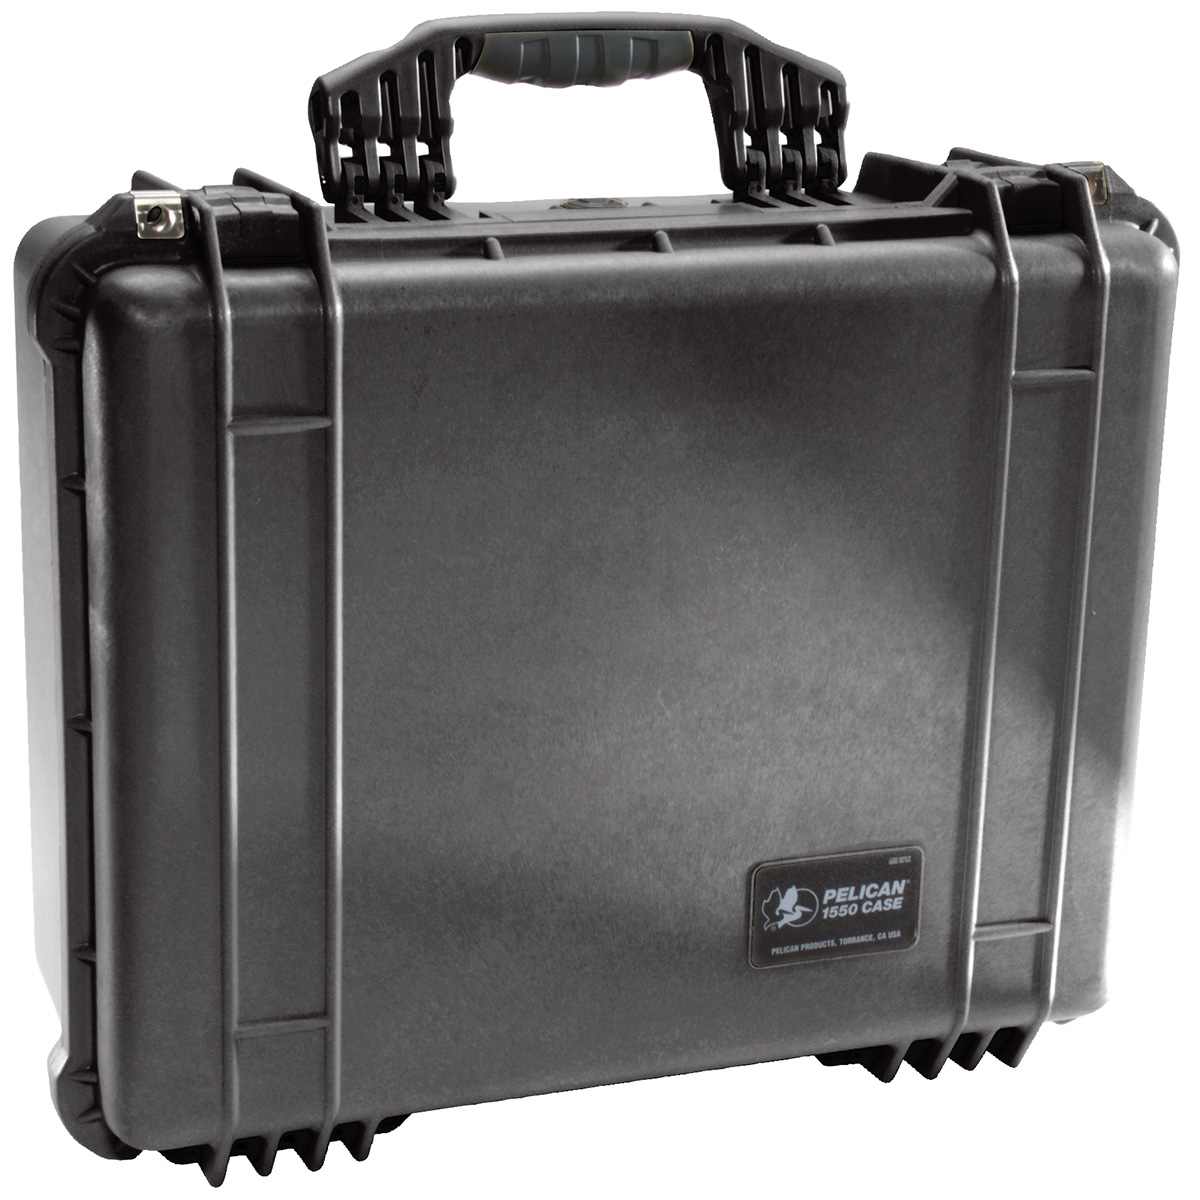 pelican hard shell dustproof tactical case